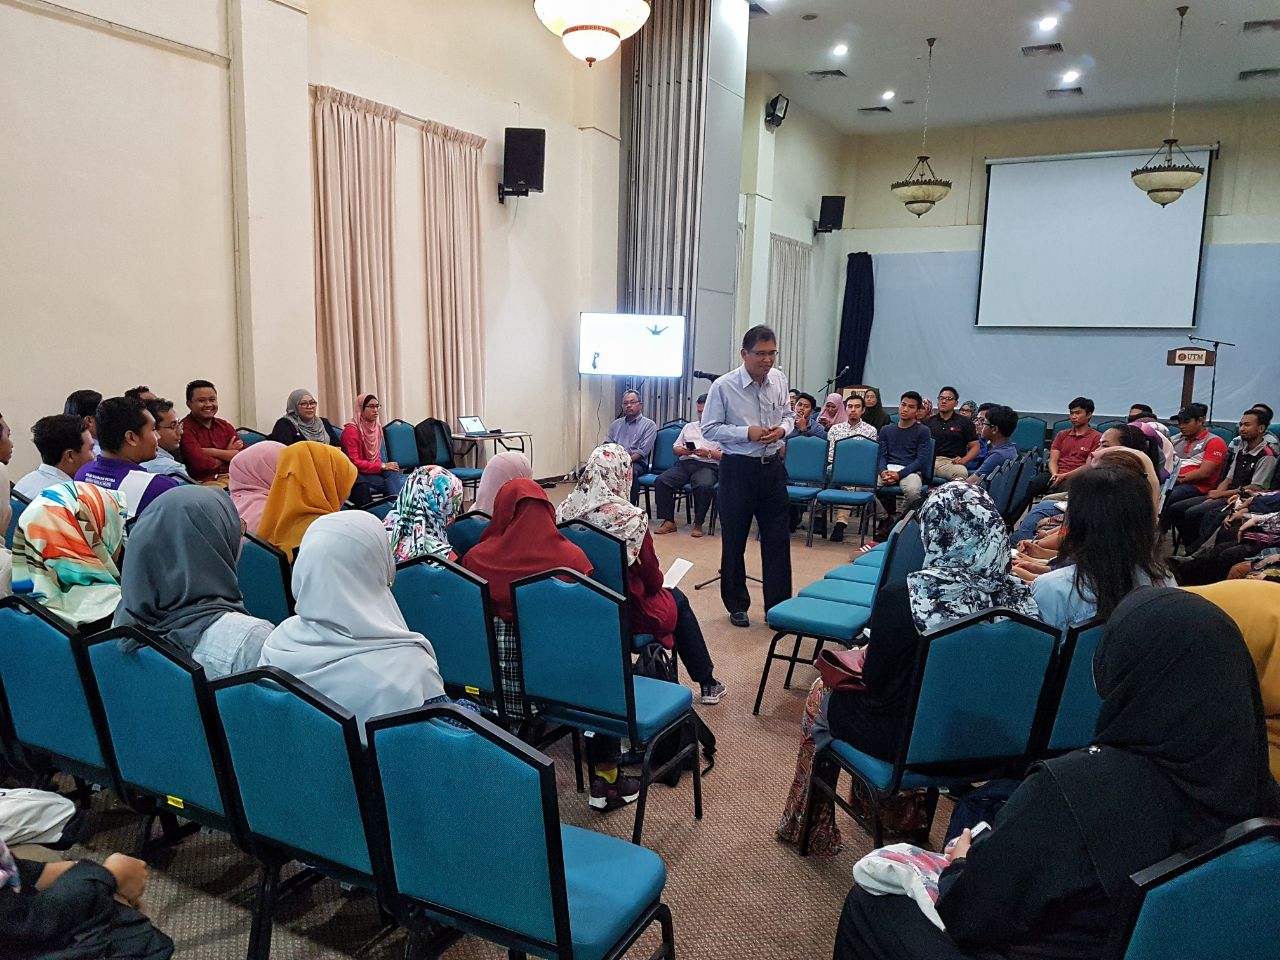 Bicara Peluang Melanjutkan Pengajian di Peringkat Pasca Siswazah bersama Dekan FAB